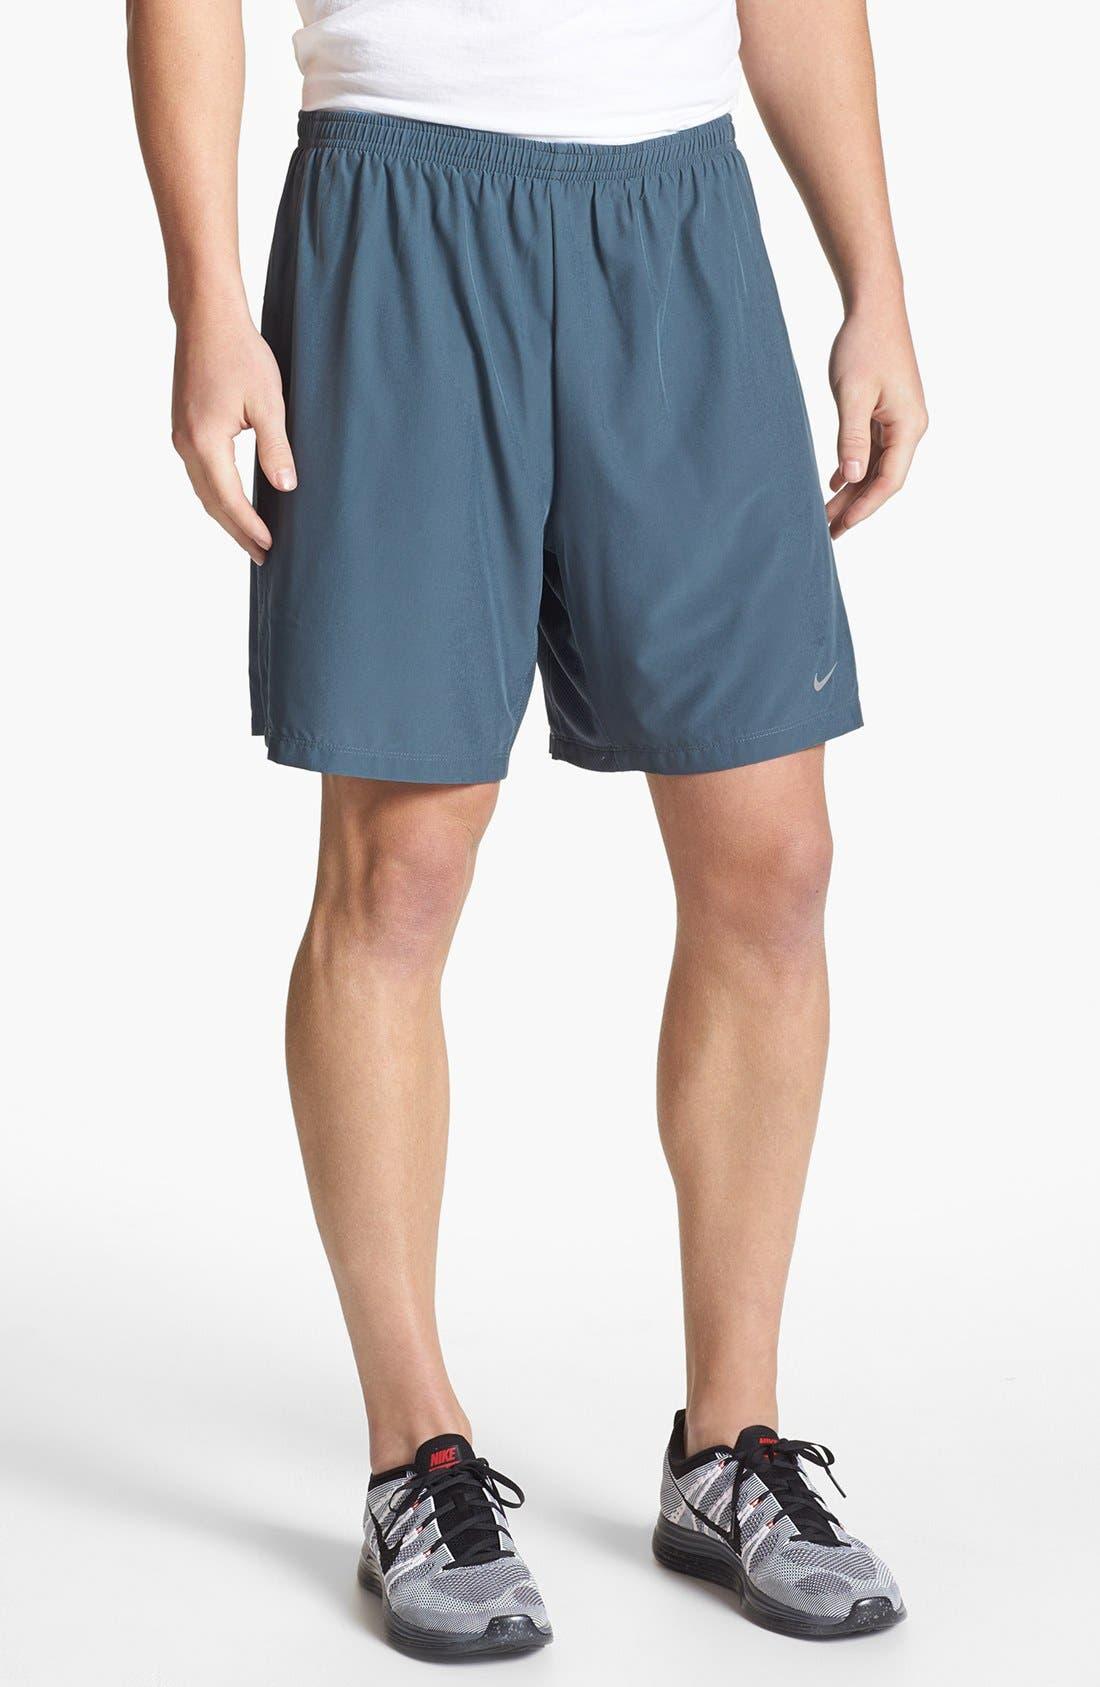 Alternate Image 1 Selected - Nike 'Phenom' 2-in-1 Shorts